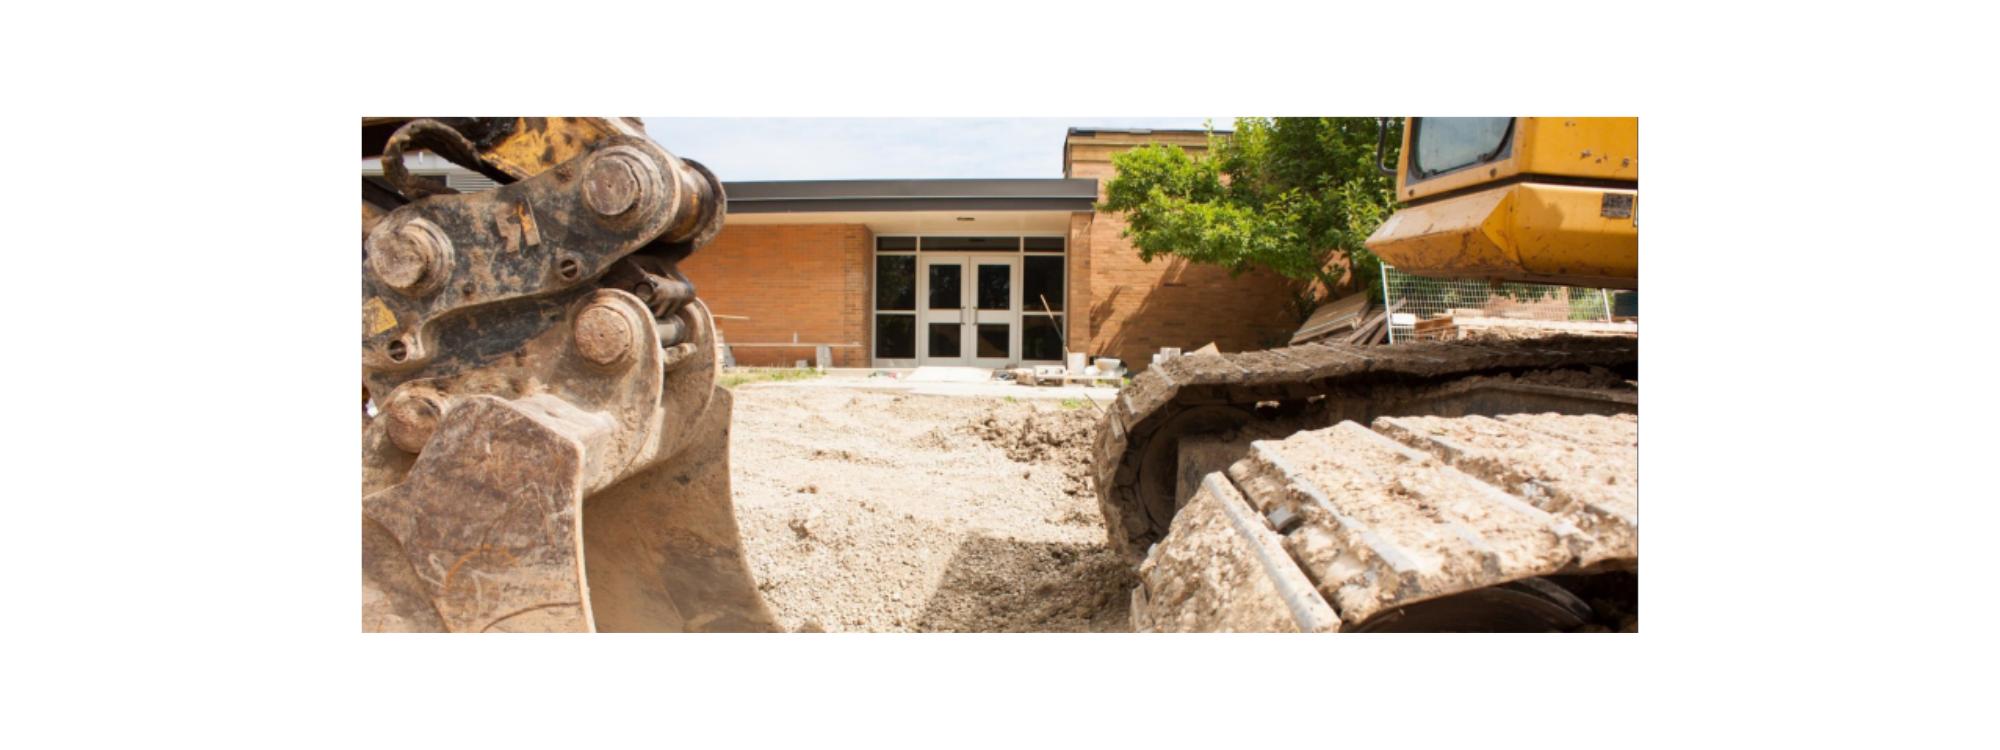 Image of new school construction